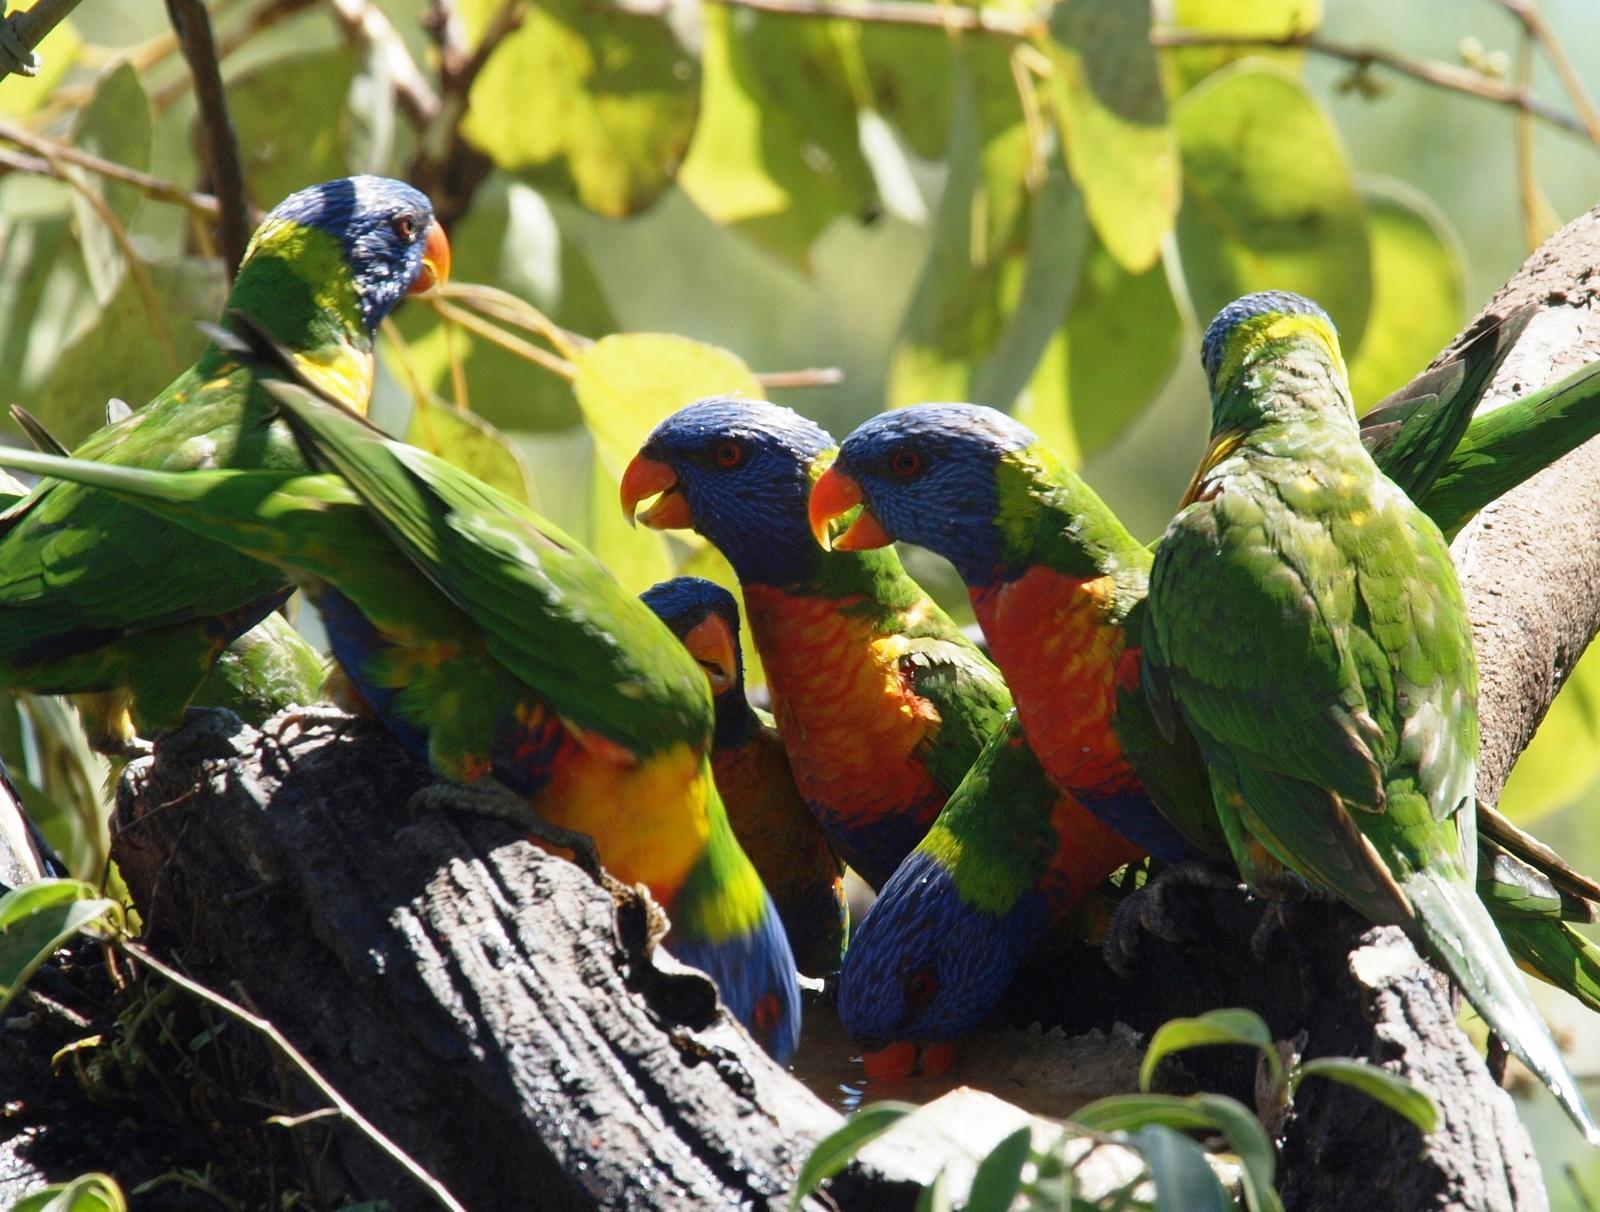 http://www.thalabeach.com.au/wp-content/uploads/2010/07/Thala_Beach_Lodge_00461.jpg